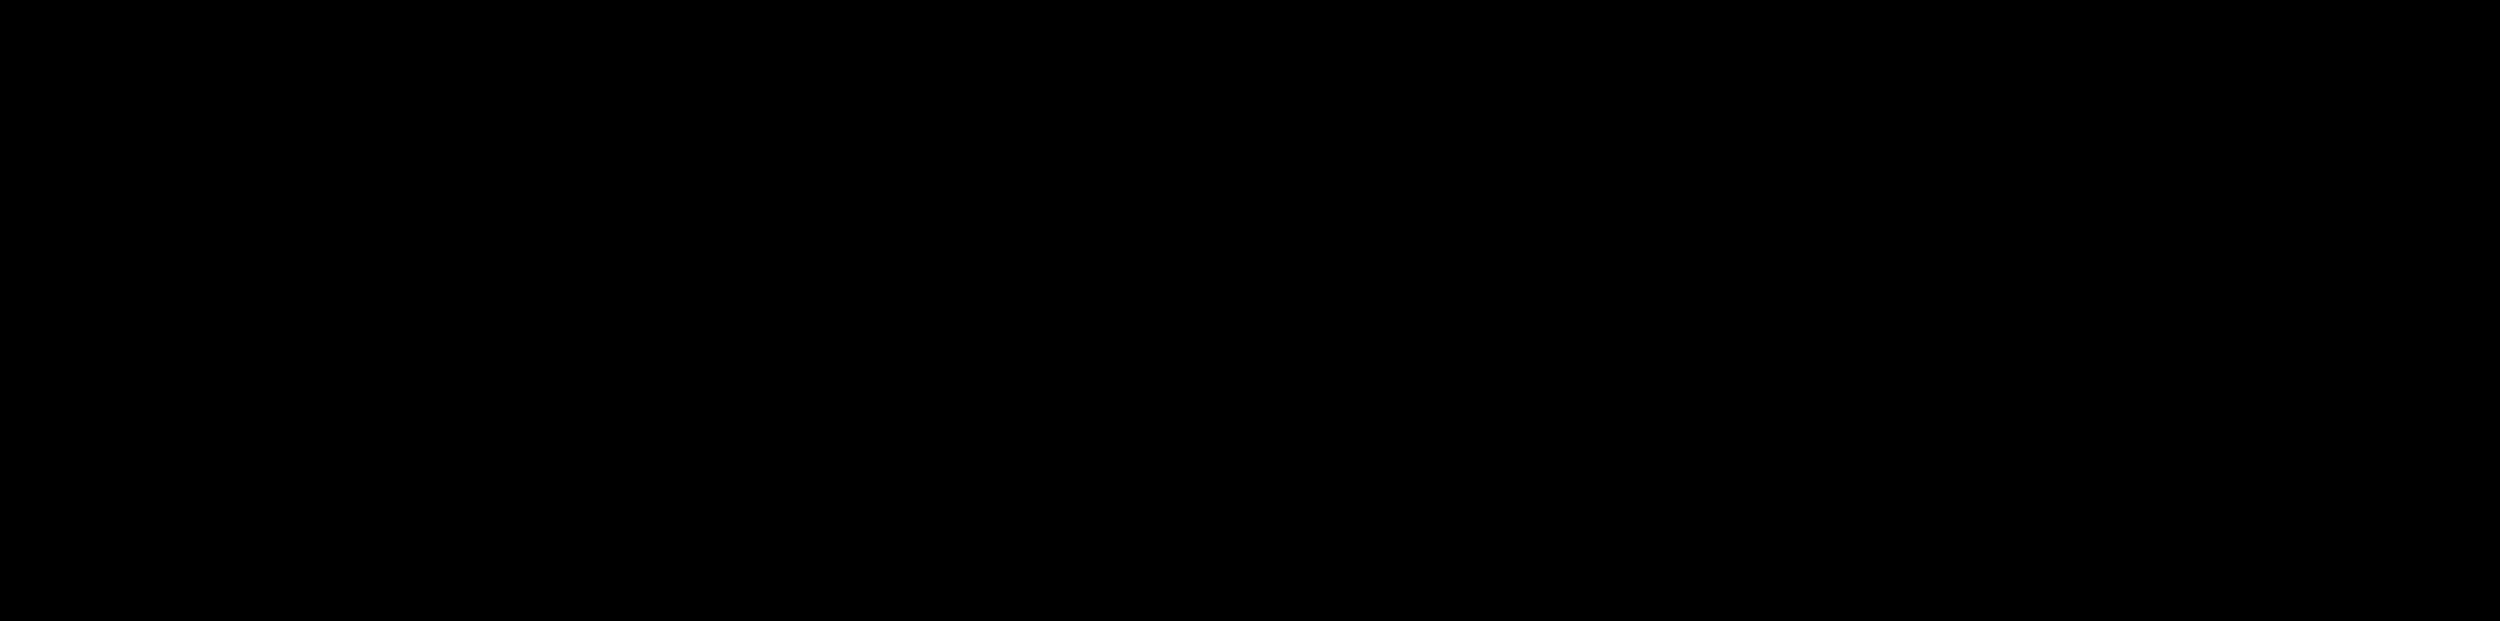 Ceramic_Adventures_logo_horizontal.png